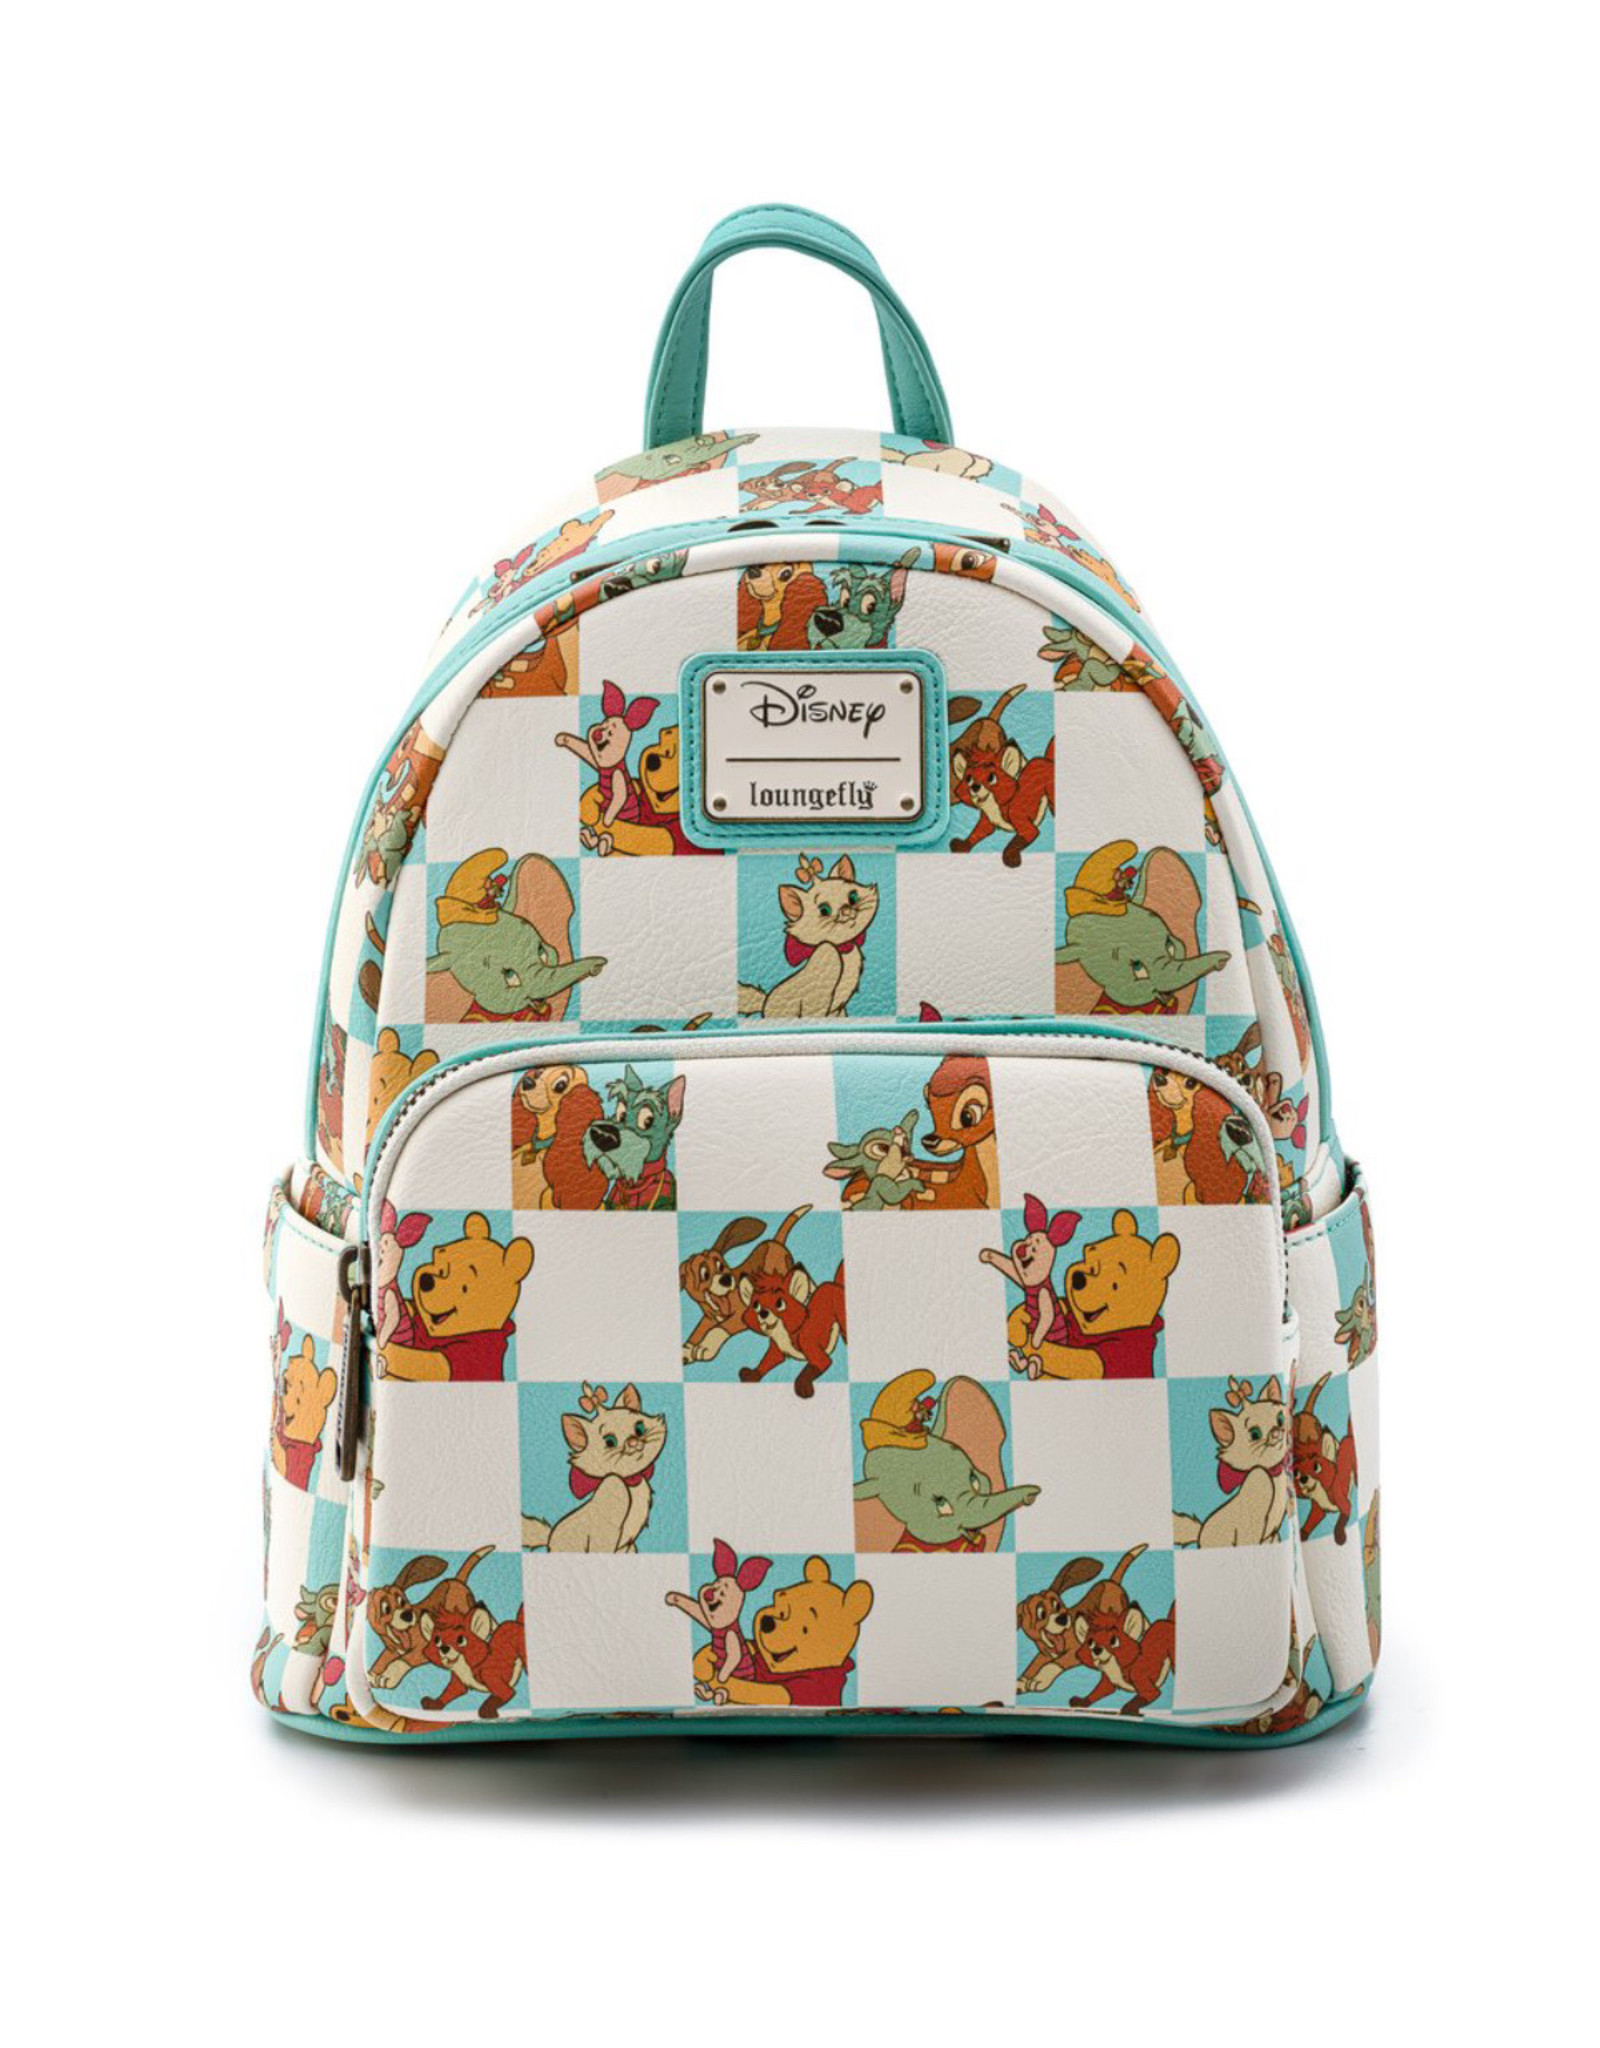 Disney Disney (  Loungefly Mini Backpack ) Disney Characters